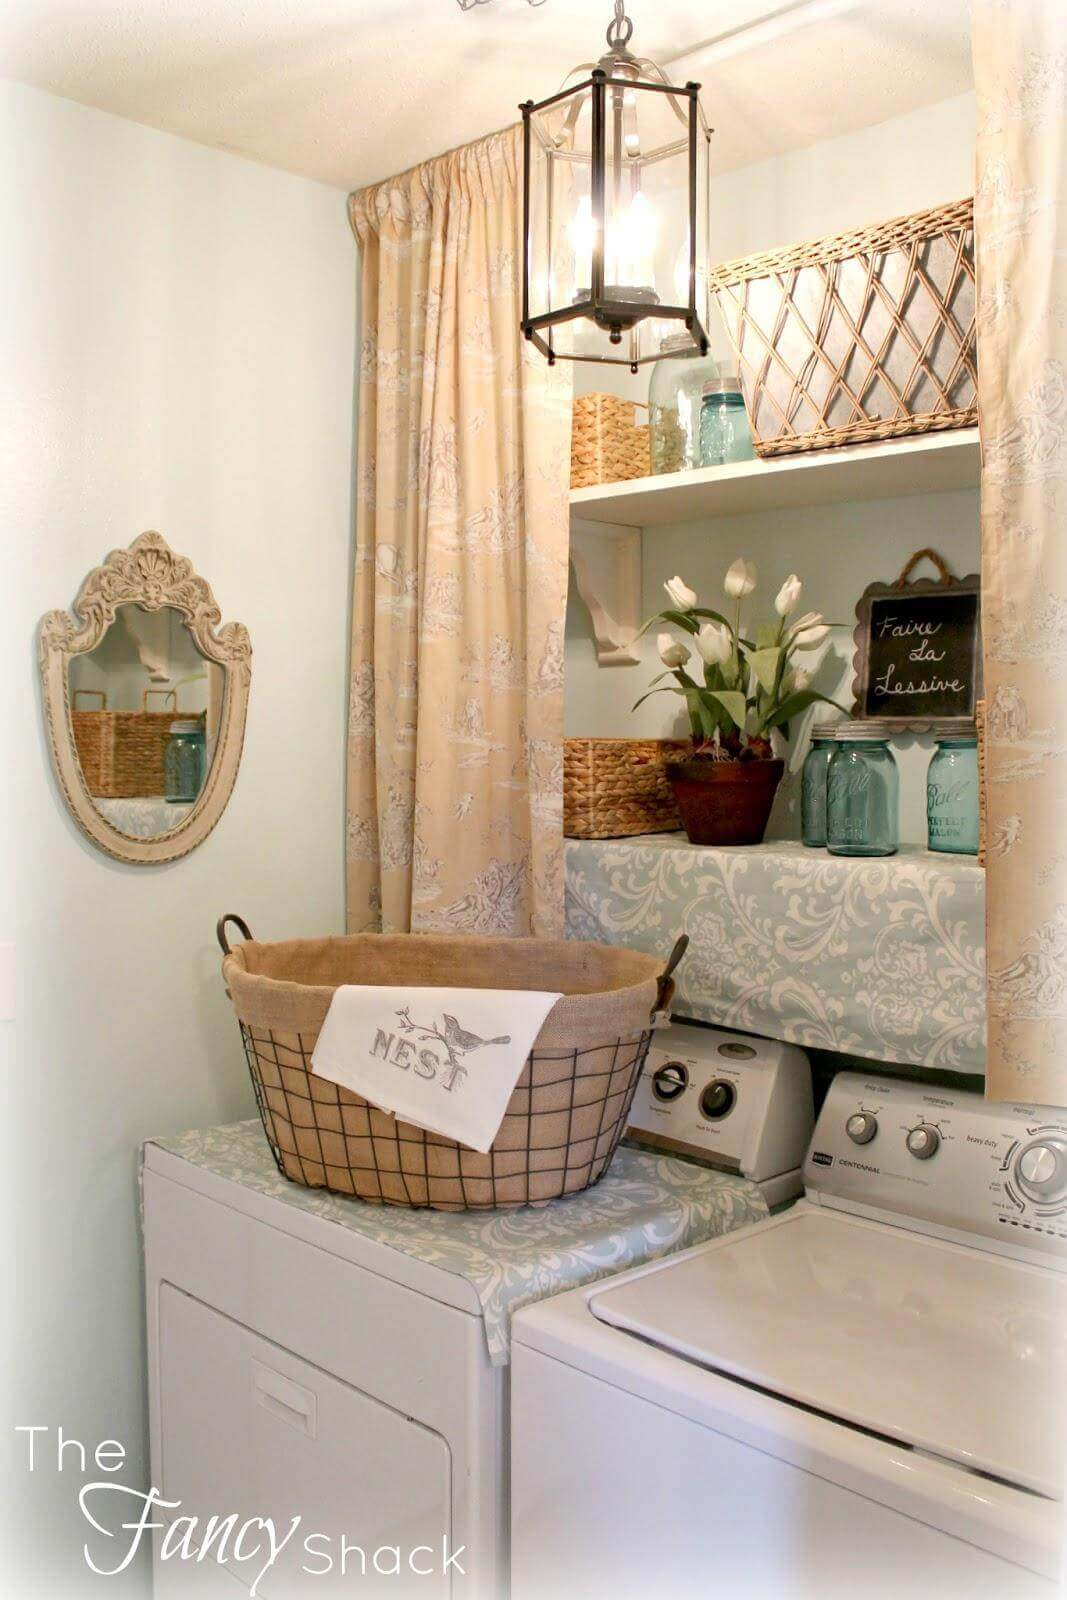 Overhead Chic Laundry Closet vs Cabinets